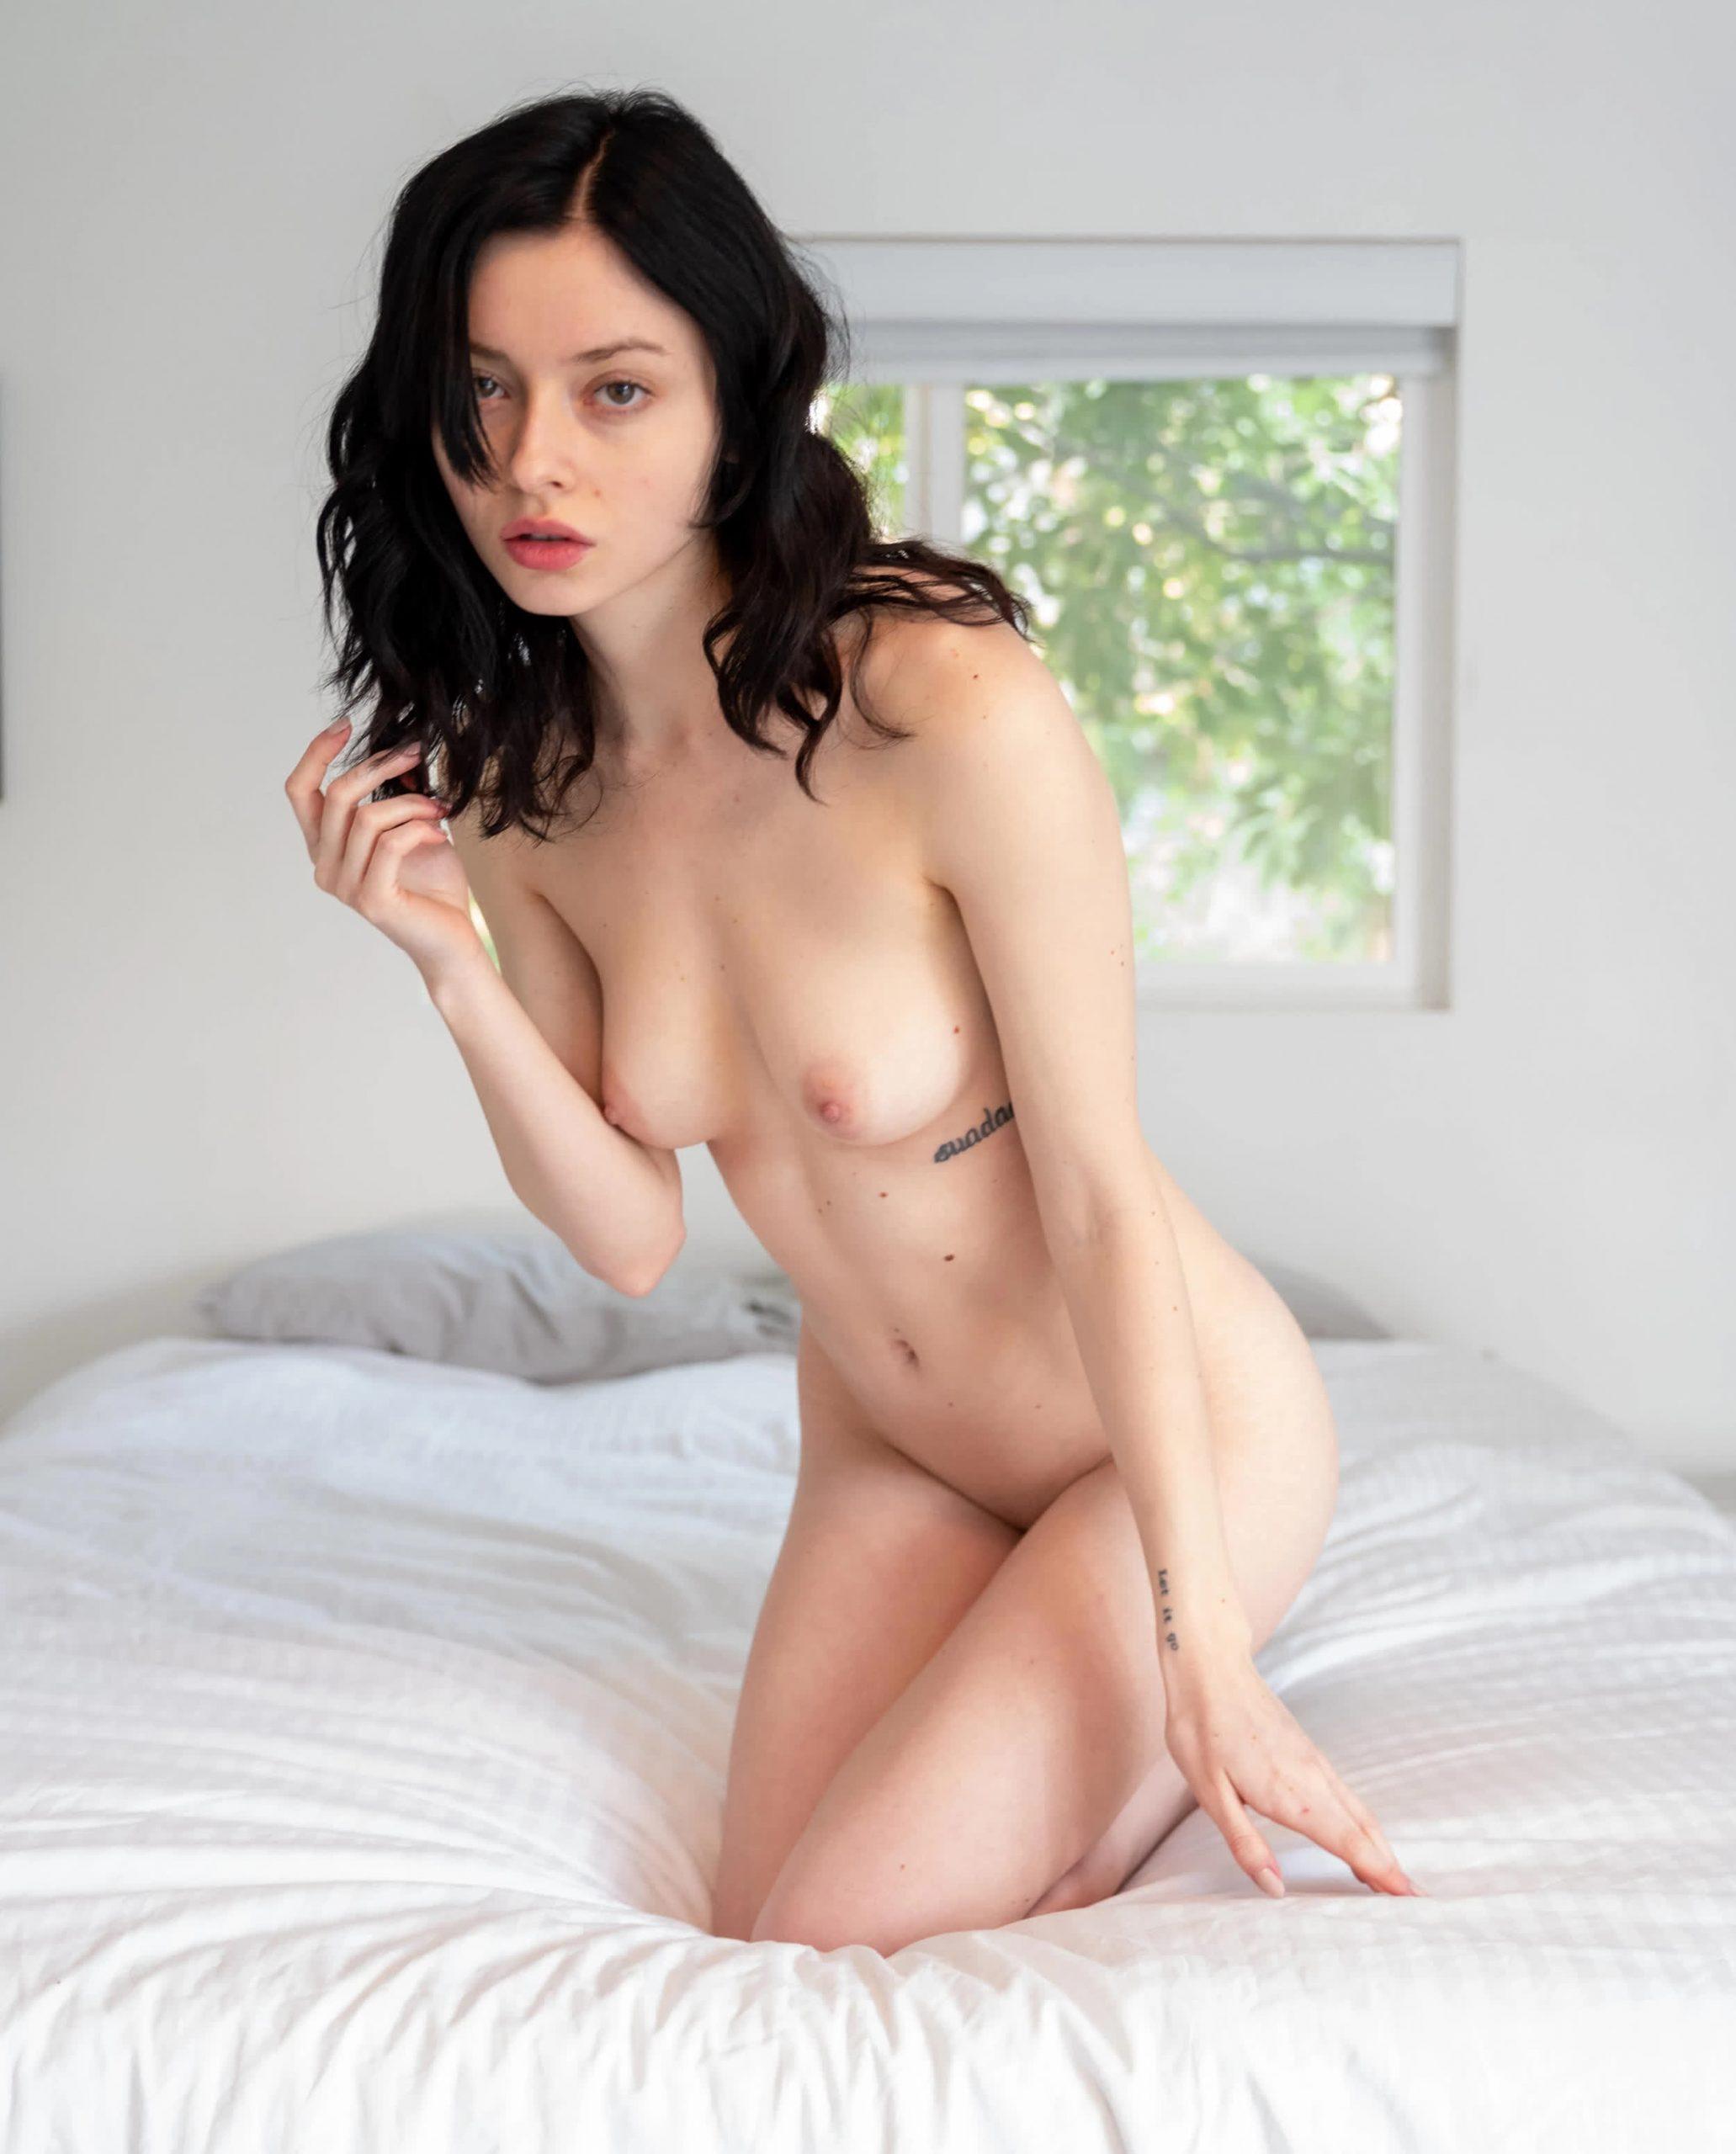 Alina Lee - Chris Jennings photoshoot